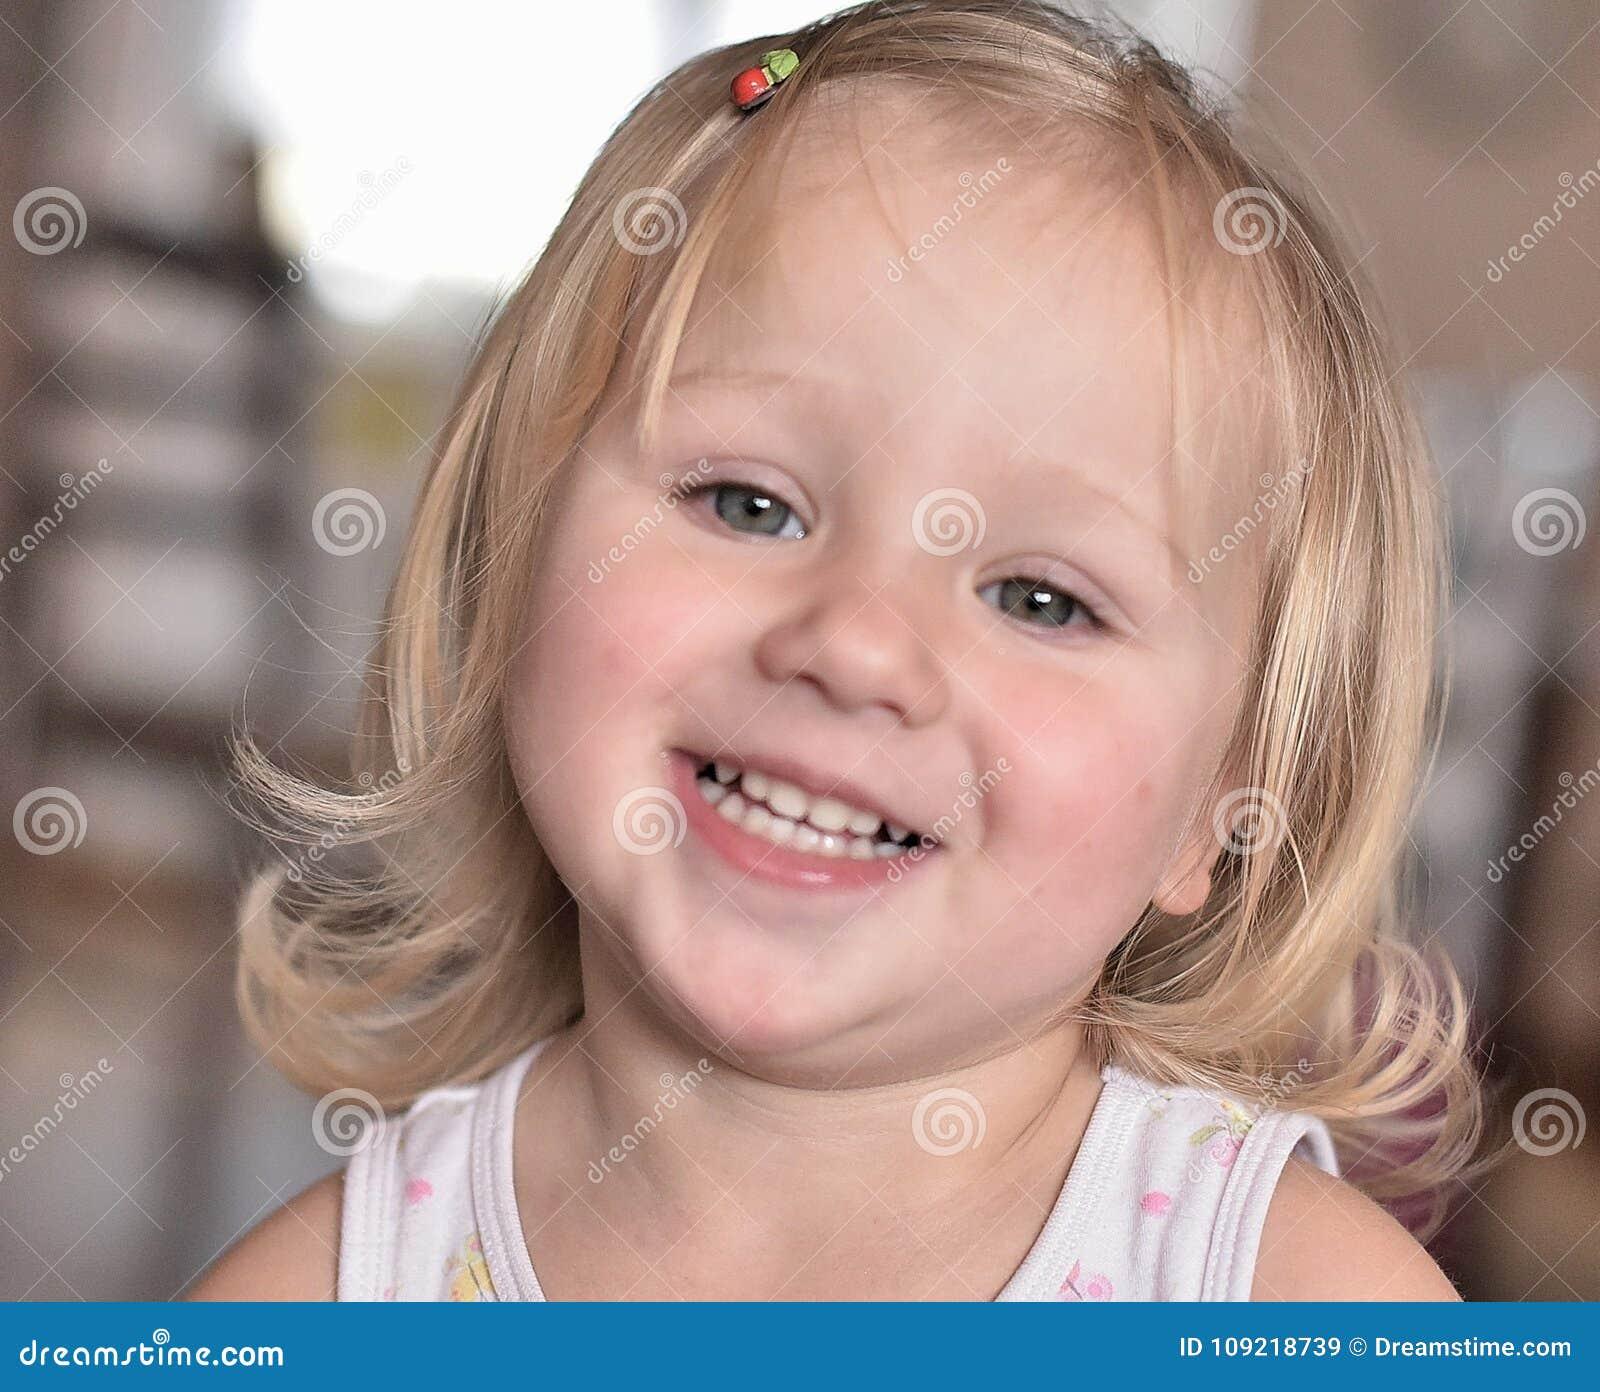 Guck λίγο ευτυχές κορίτσι με ένα ανοικτό χαμόγελο